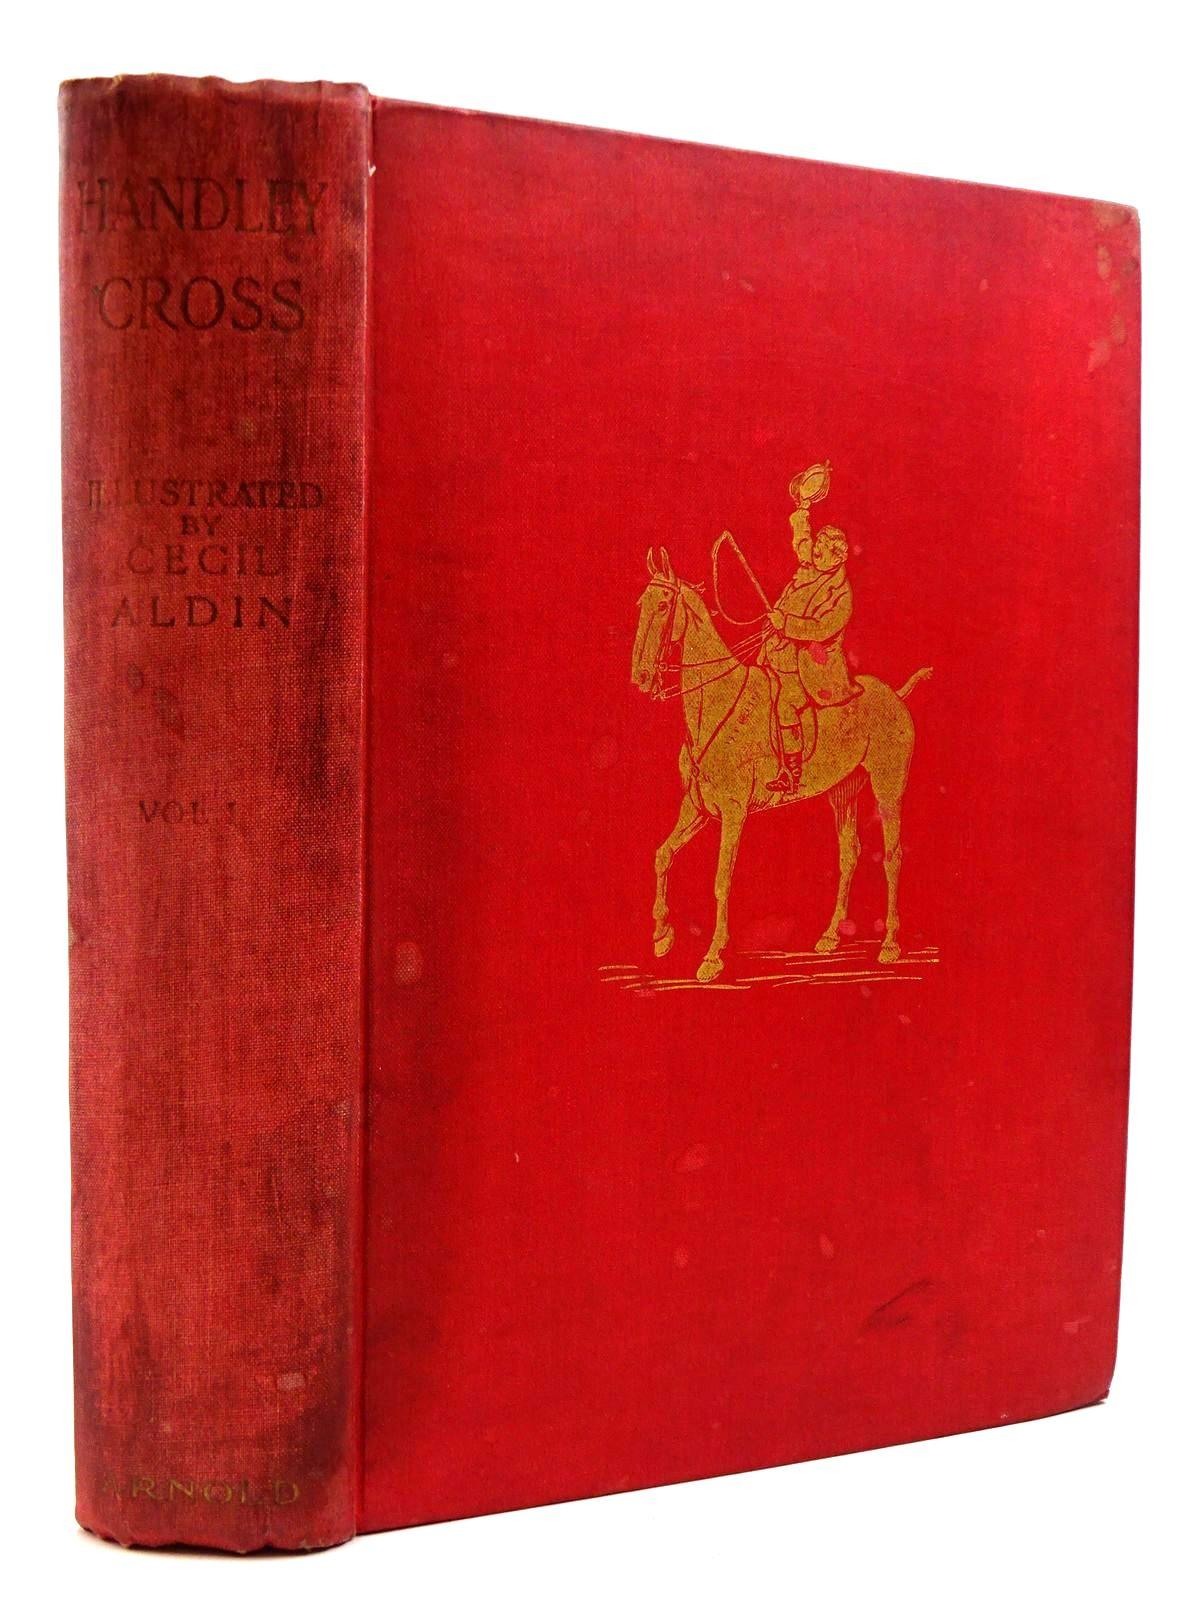 Photo of HANDLEY CROSS OR MR. JORROCKS'S HUNT - VOLUME I- Stock Number: 2130785